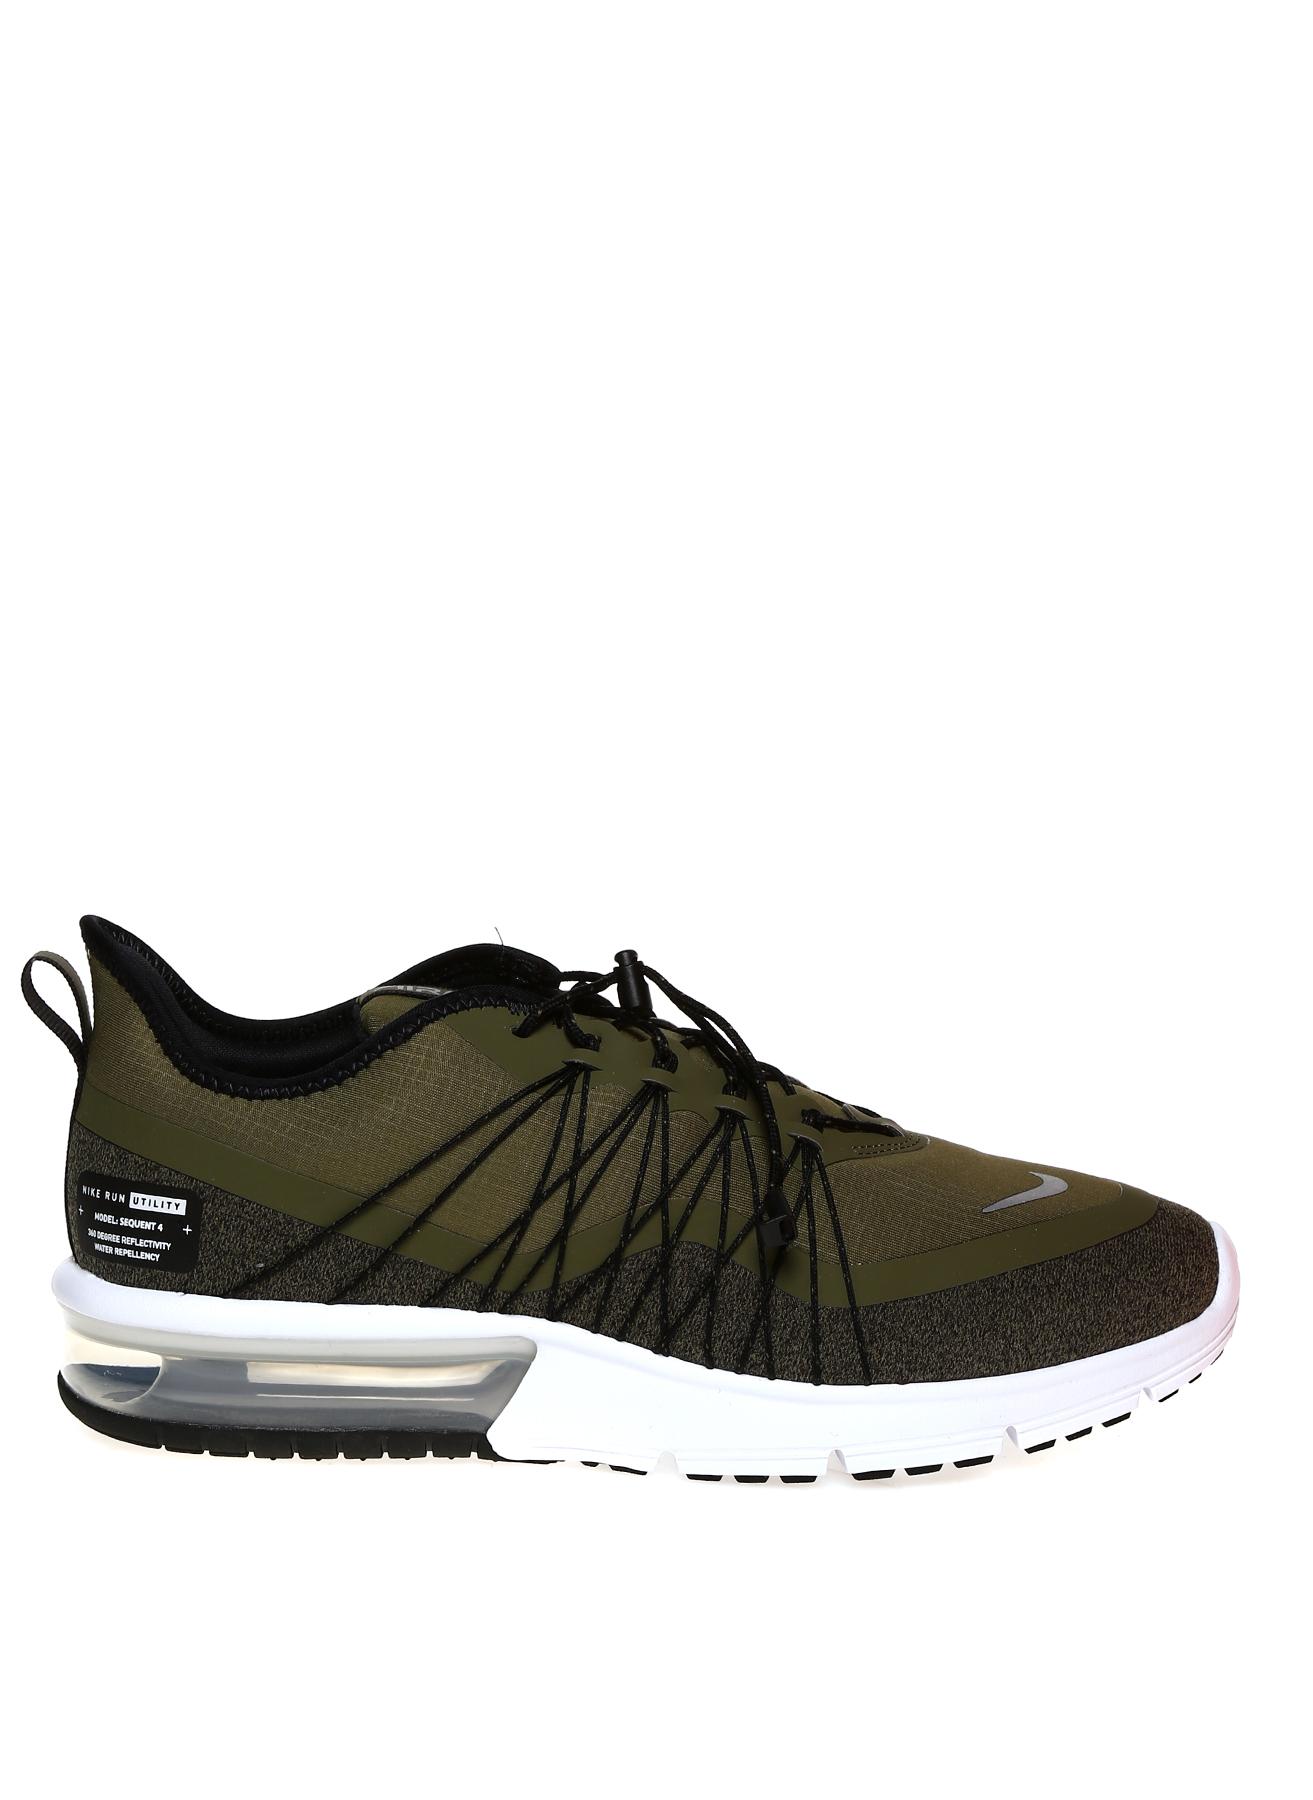 Nike Air Max Sequent 4 Utility Lifestyle Ayakkabı 42.5 5002328978005 Ürün Resmi